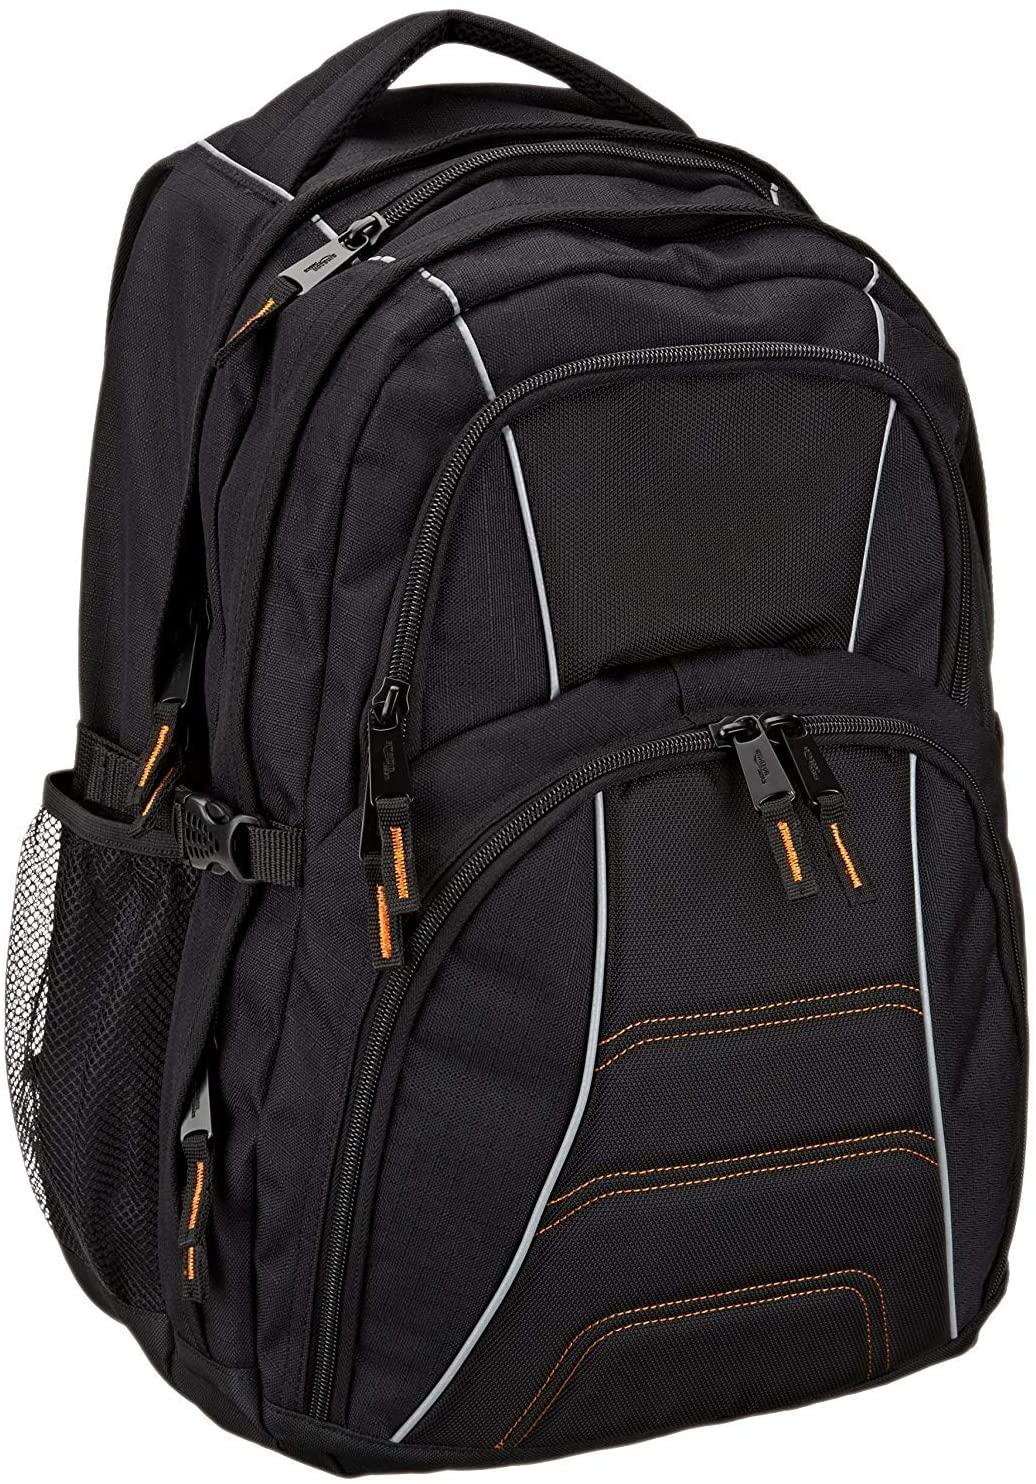 AmazonBasics Laptop Computer Backpack - Fits most 17 Inch/43 cm Laptops - Black